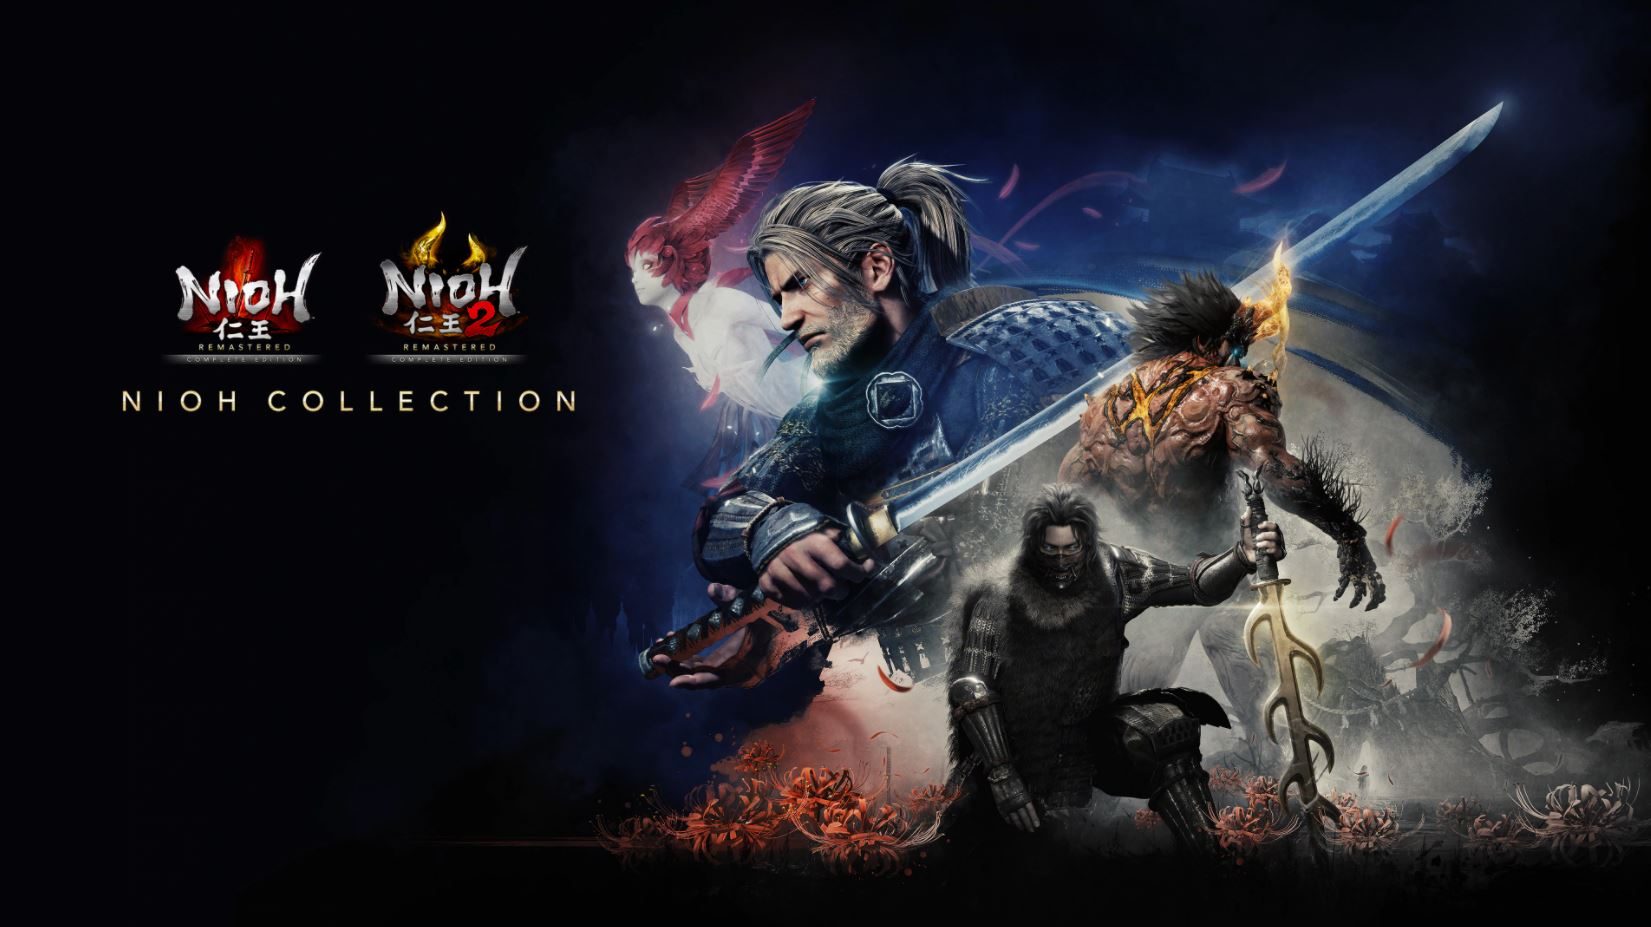 nioh-collection-ps5-news-reviews-videos